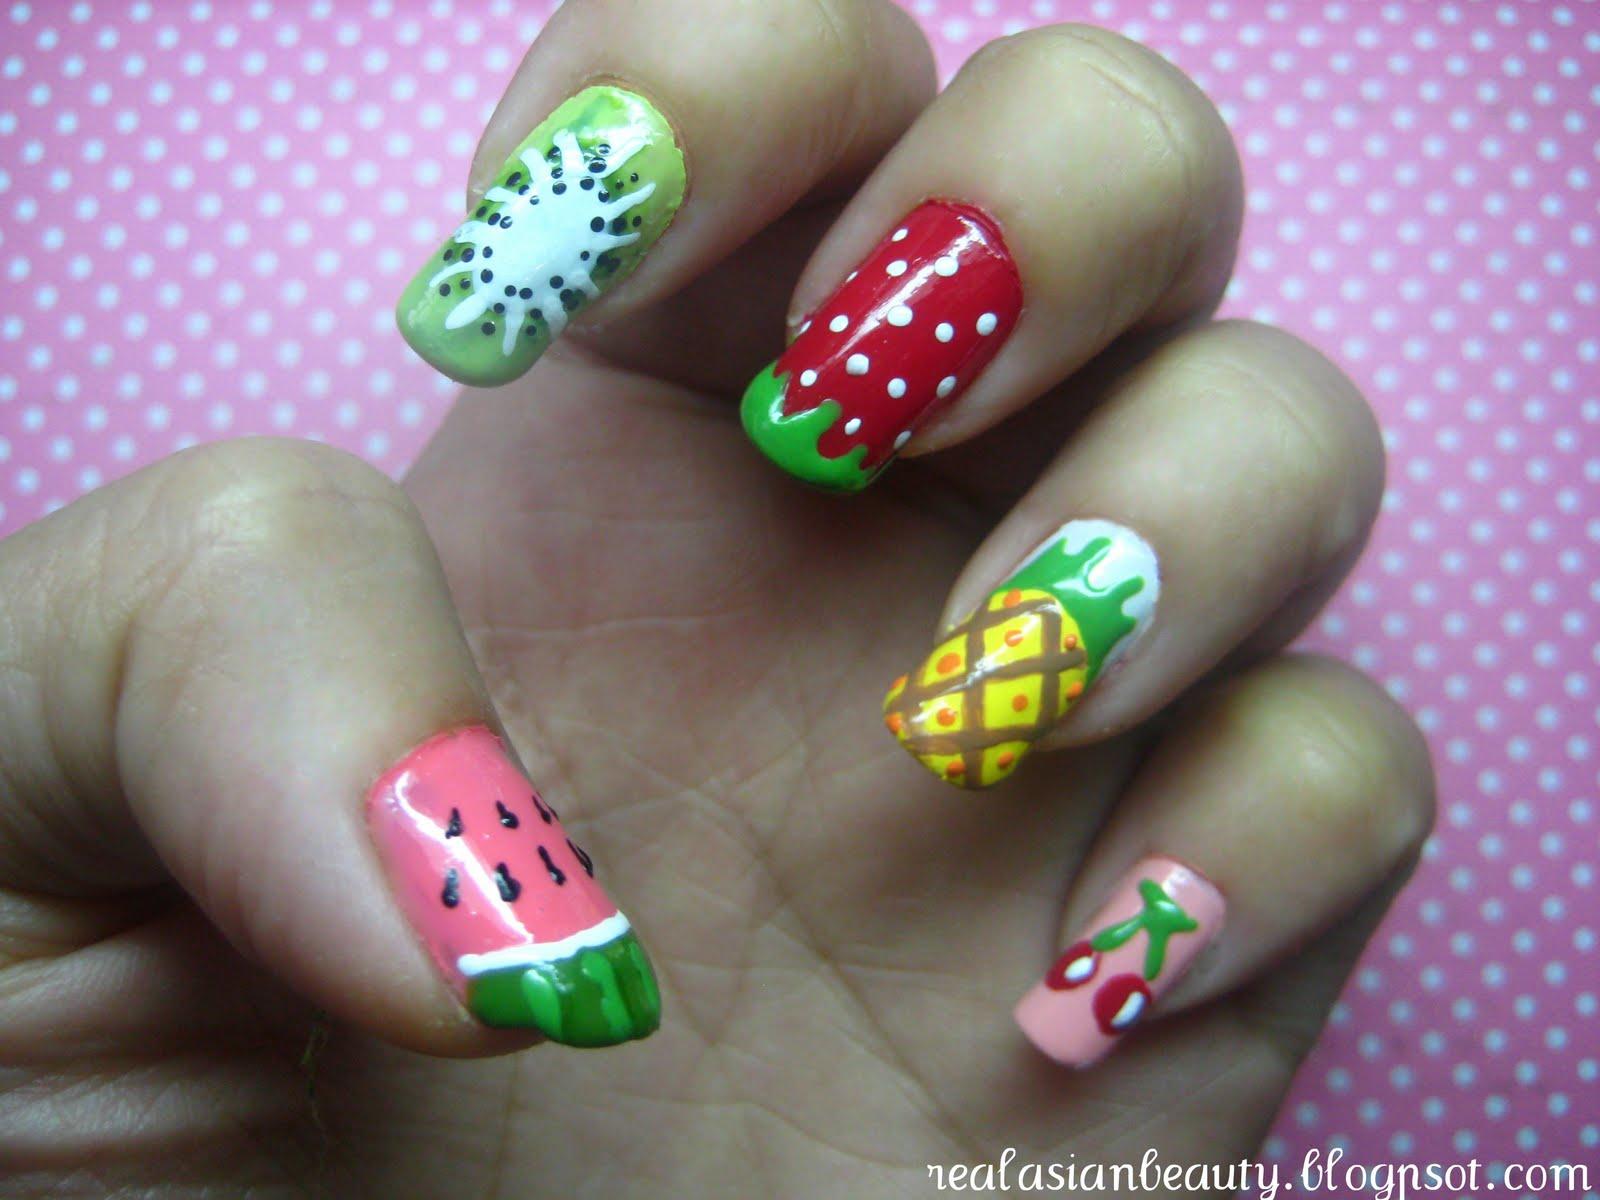 Real Asian Beauty: Summer Fruits Nail Art (Watermelon Kiwi Strawberry ...